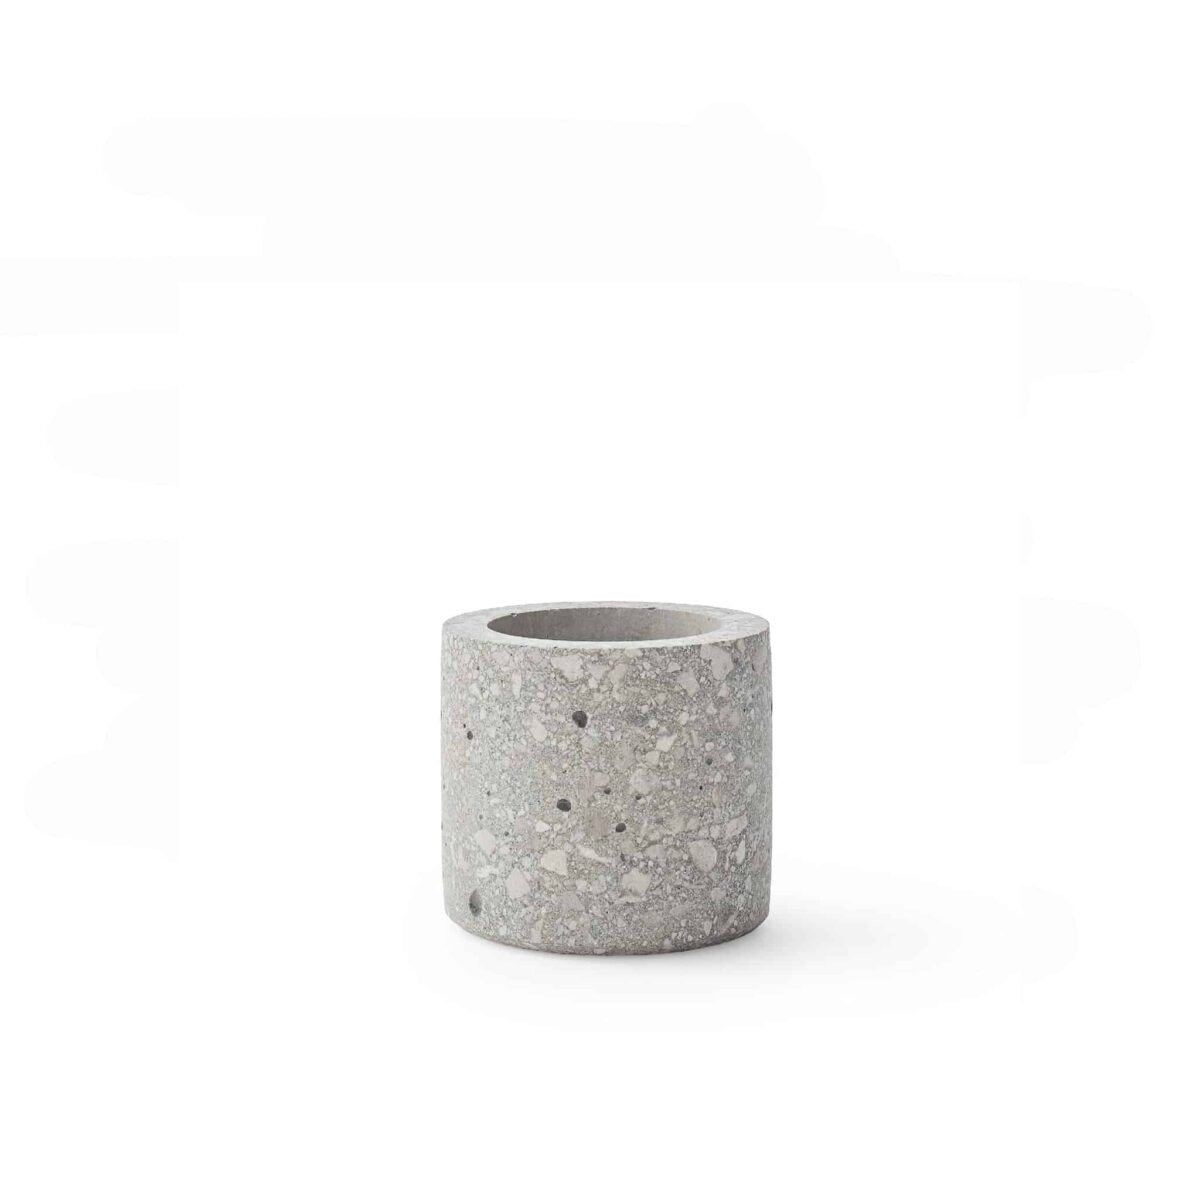 Conpot-Votive-Grey-001